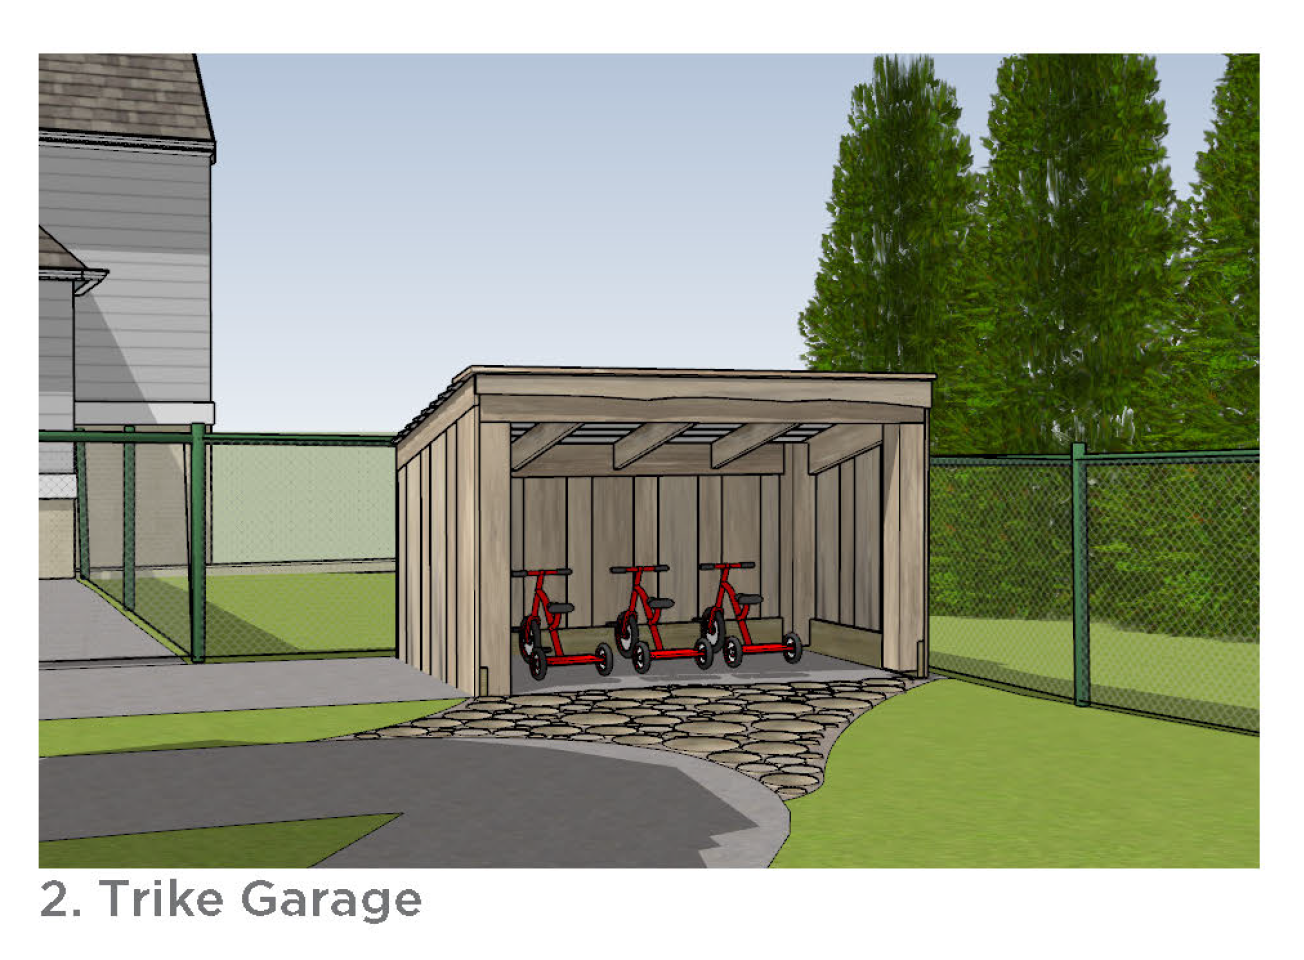 Trike Garage